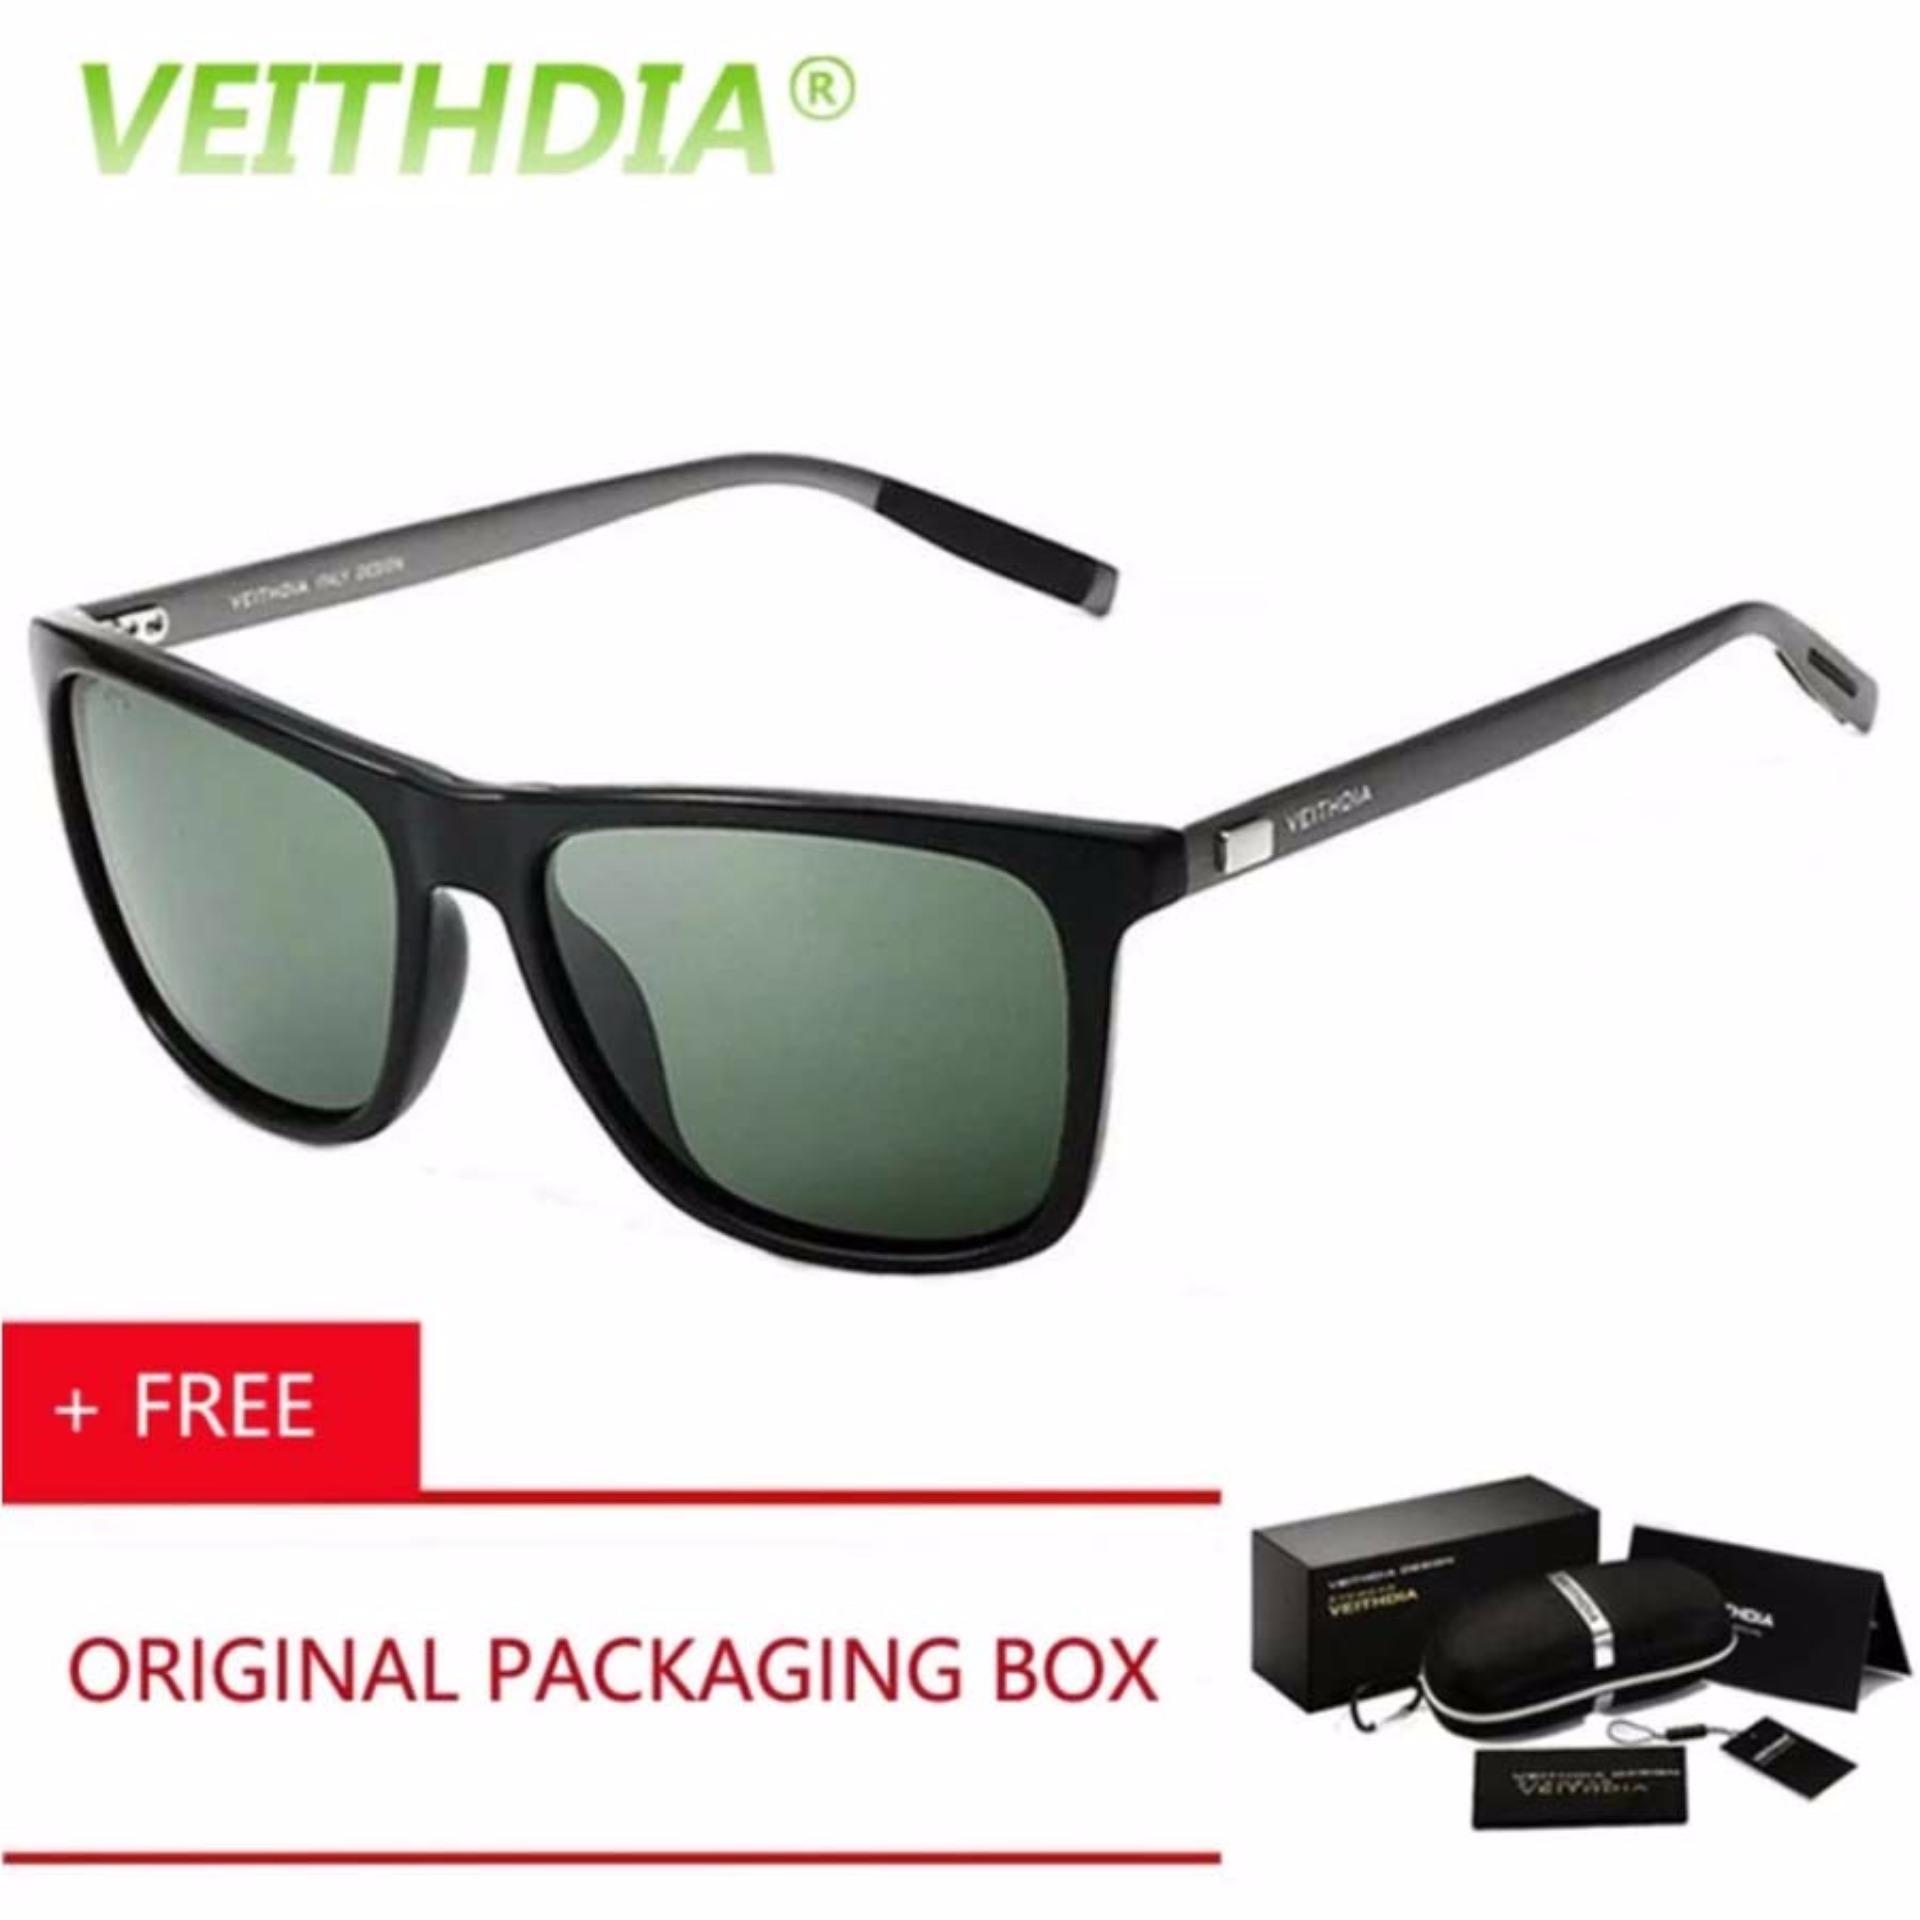 Perbandingan Harga Veithdia Kacamata Hitam Aluminium Sport Dan Travel Elegant Mirrored Uv400 Polarized Sunglasses 6108 Veithdia Di Jawa Barat